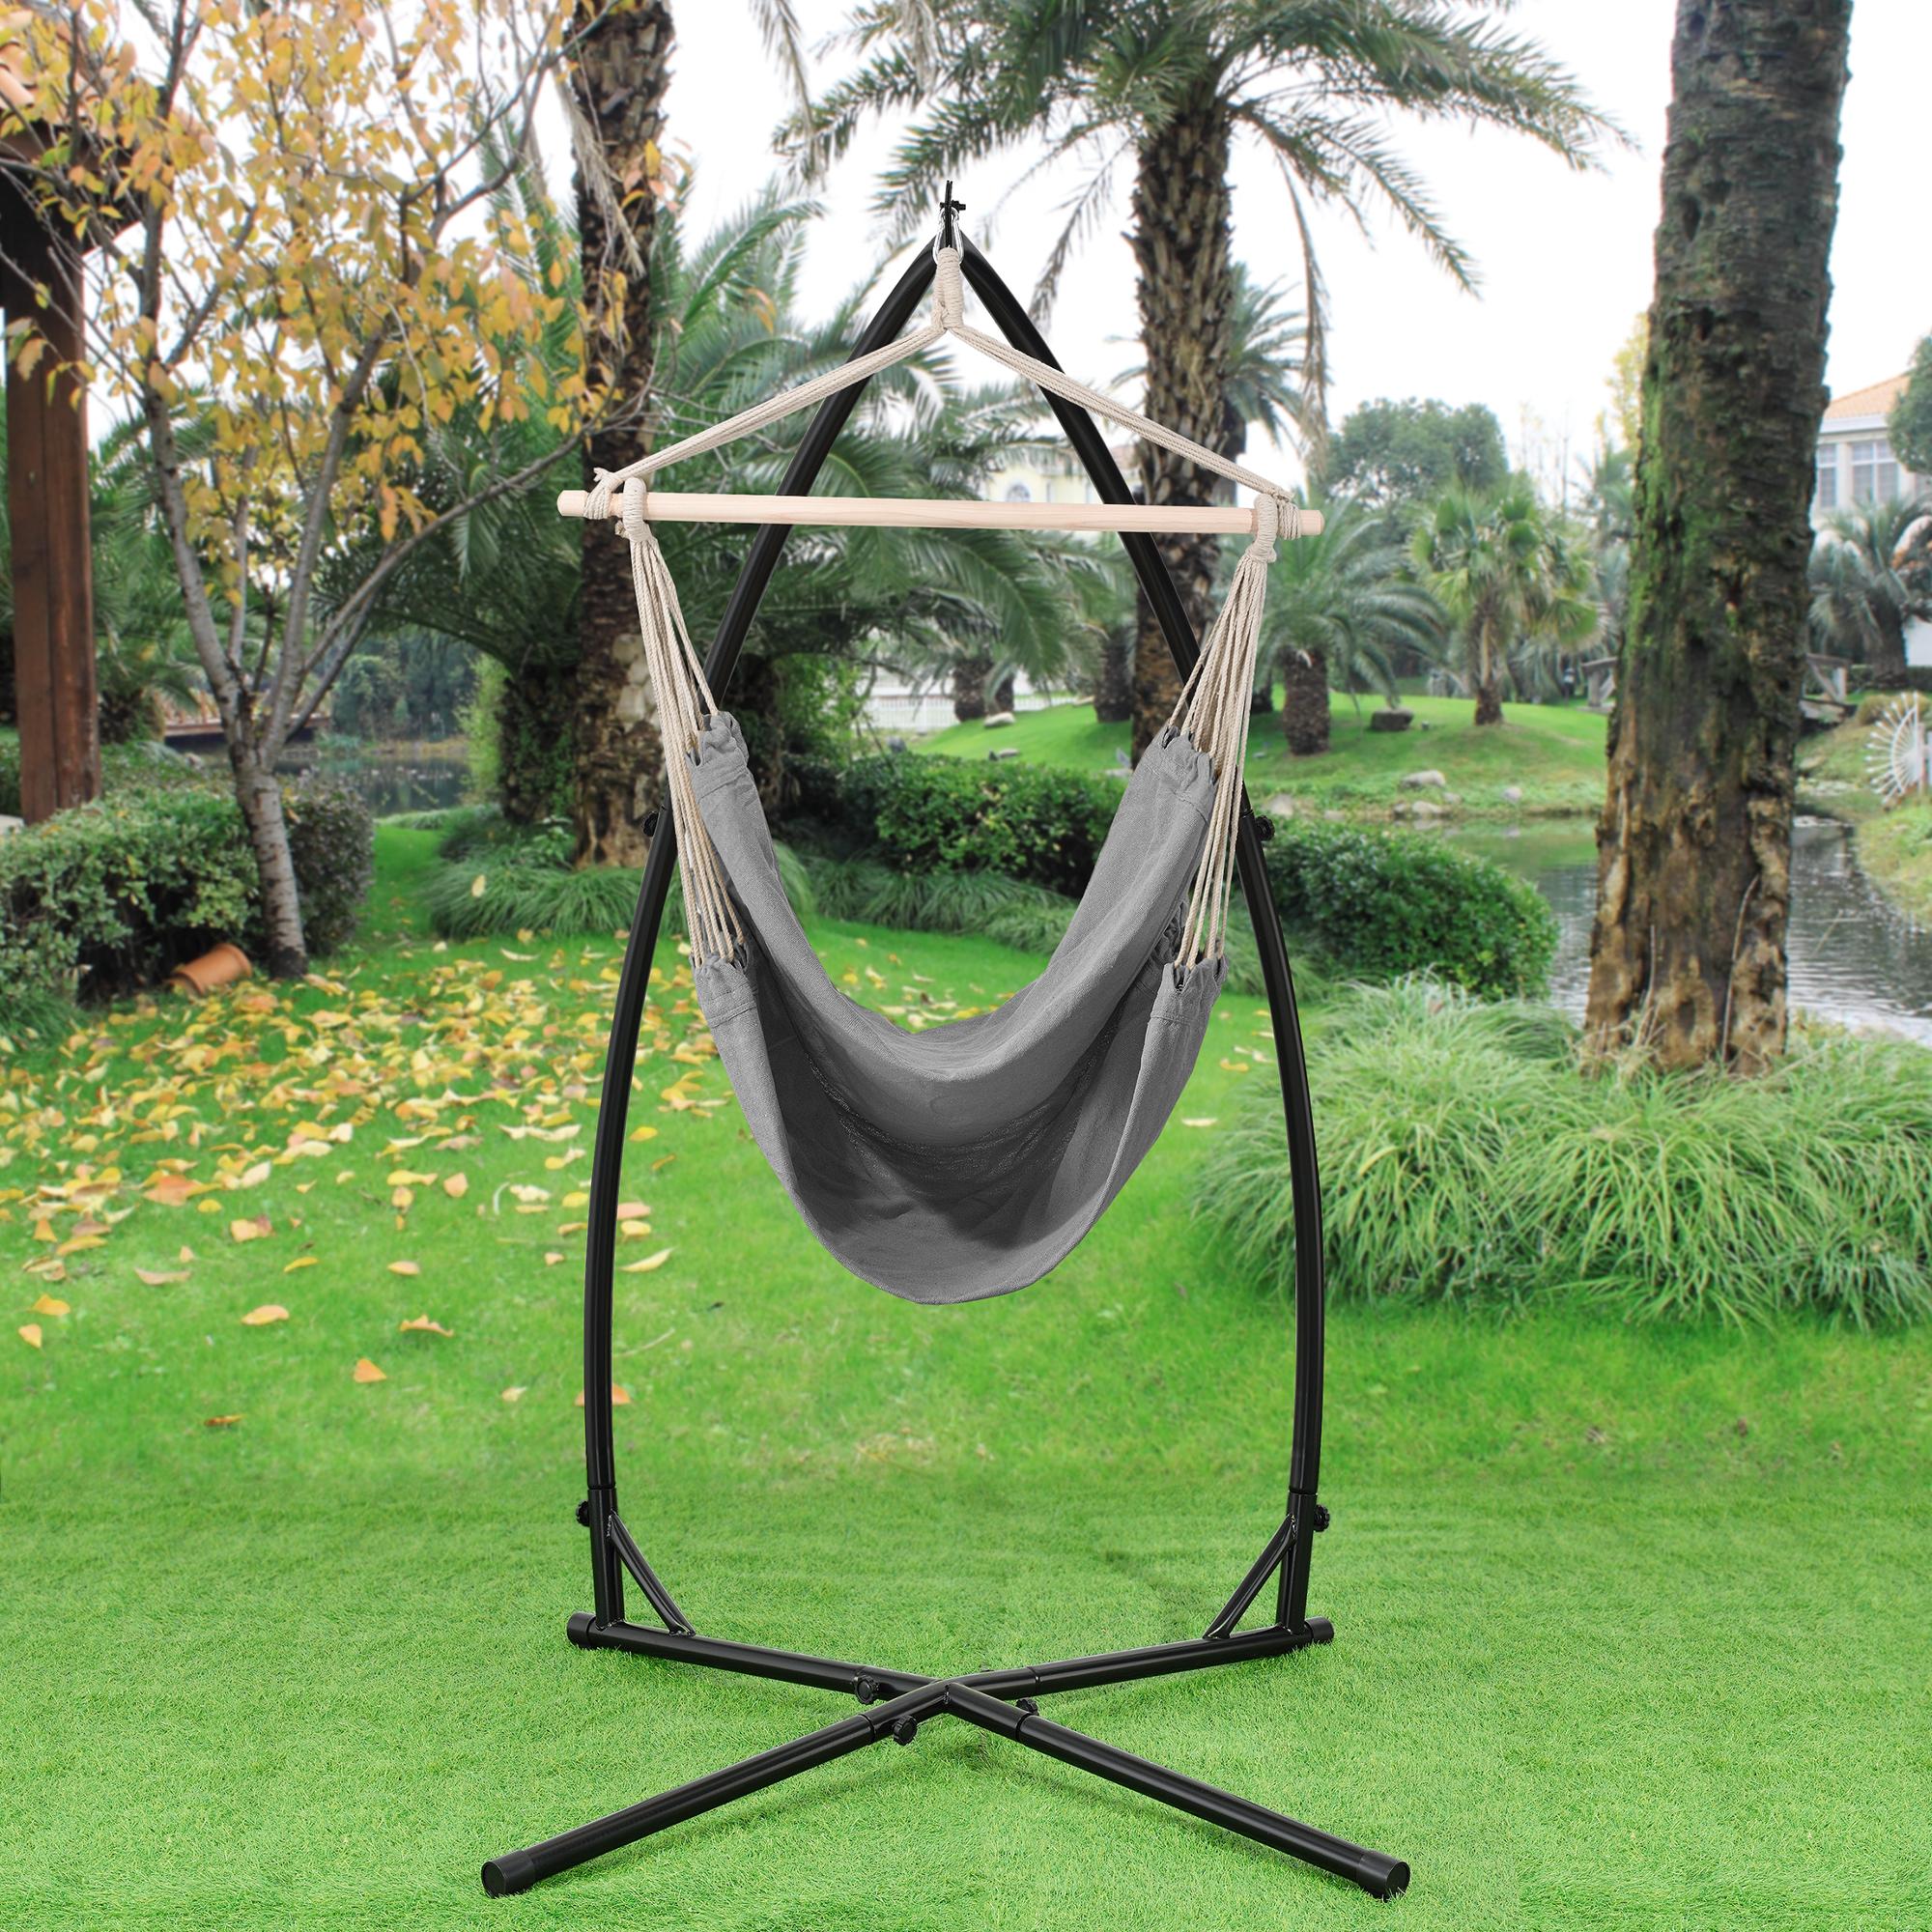 bl tter zaun gr n sichtschutz windschutz zaun garten balkon sonnen ebay. Black Bedroom Furniture Sets. Home Design Ideas